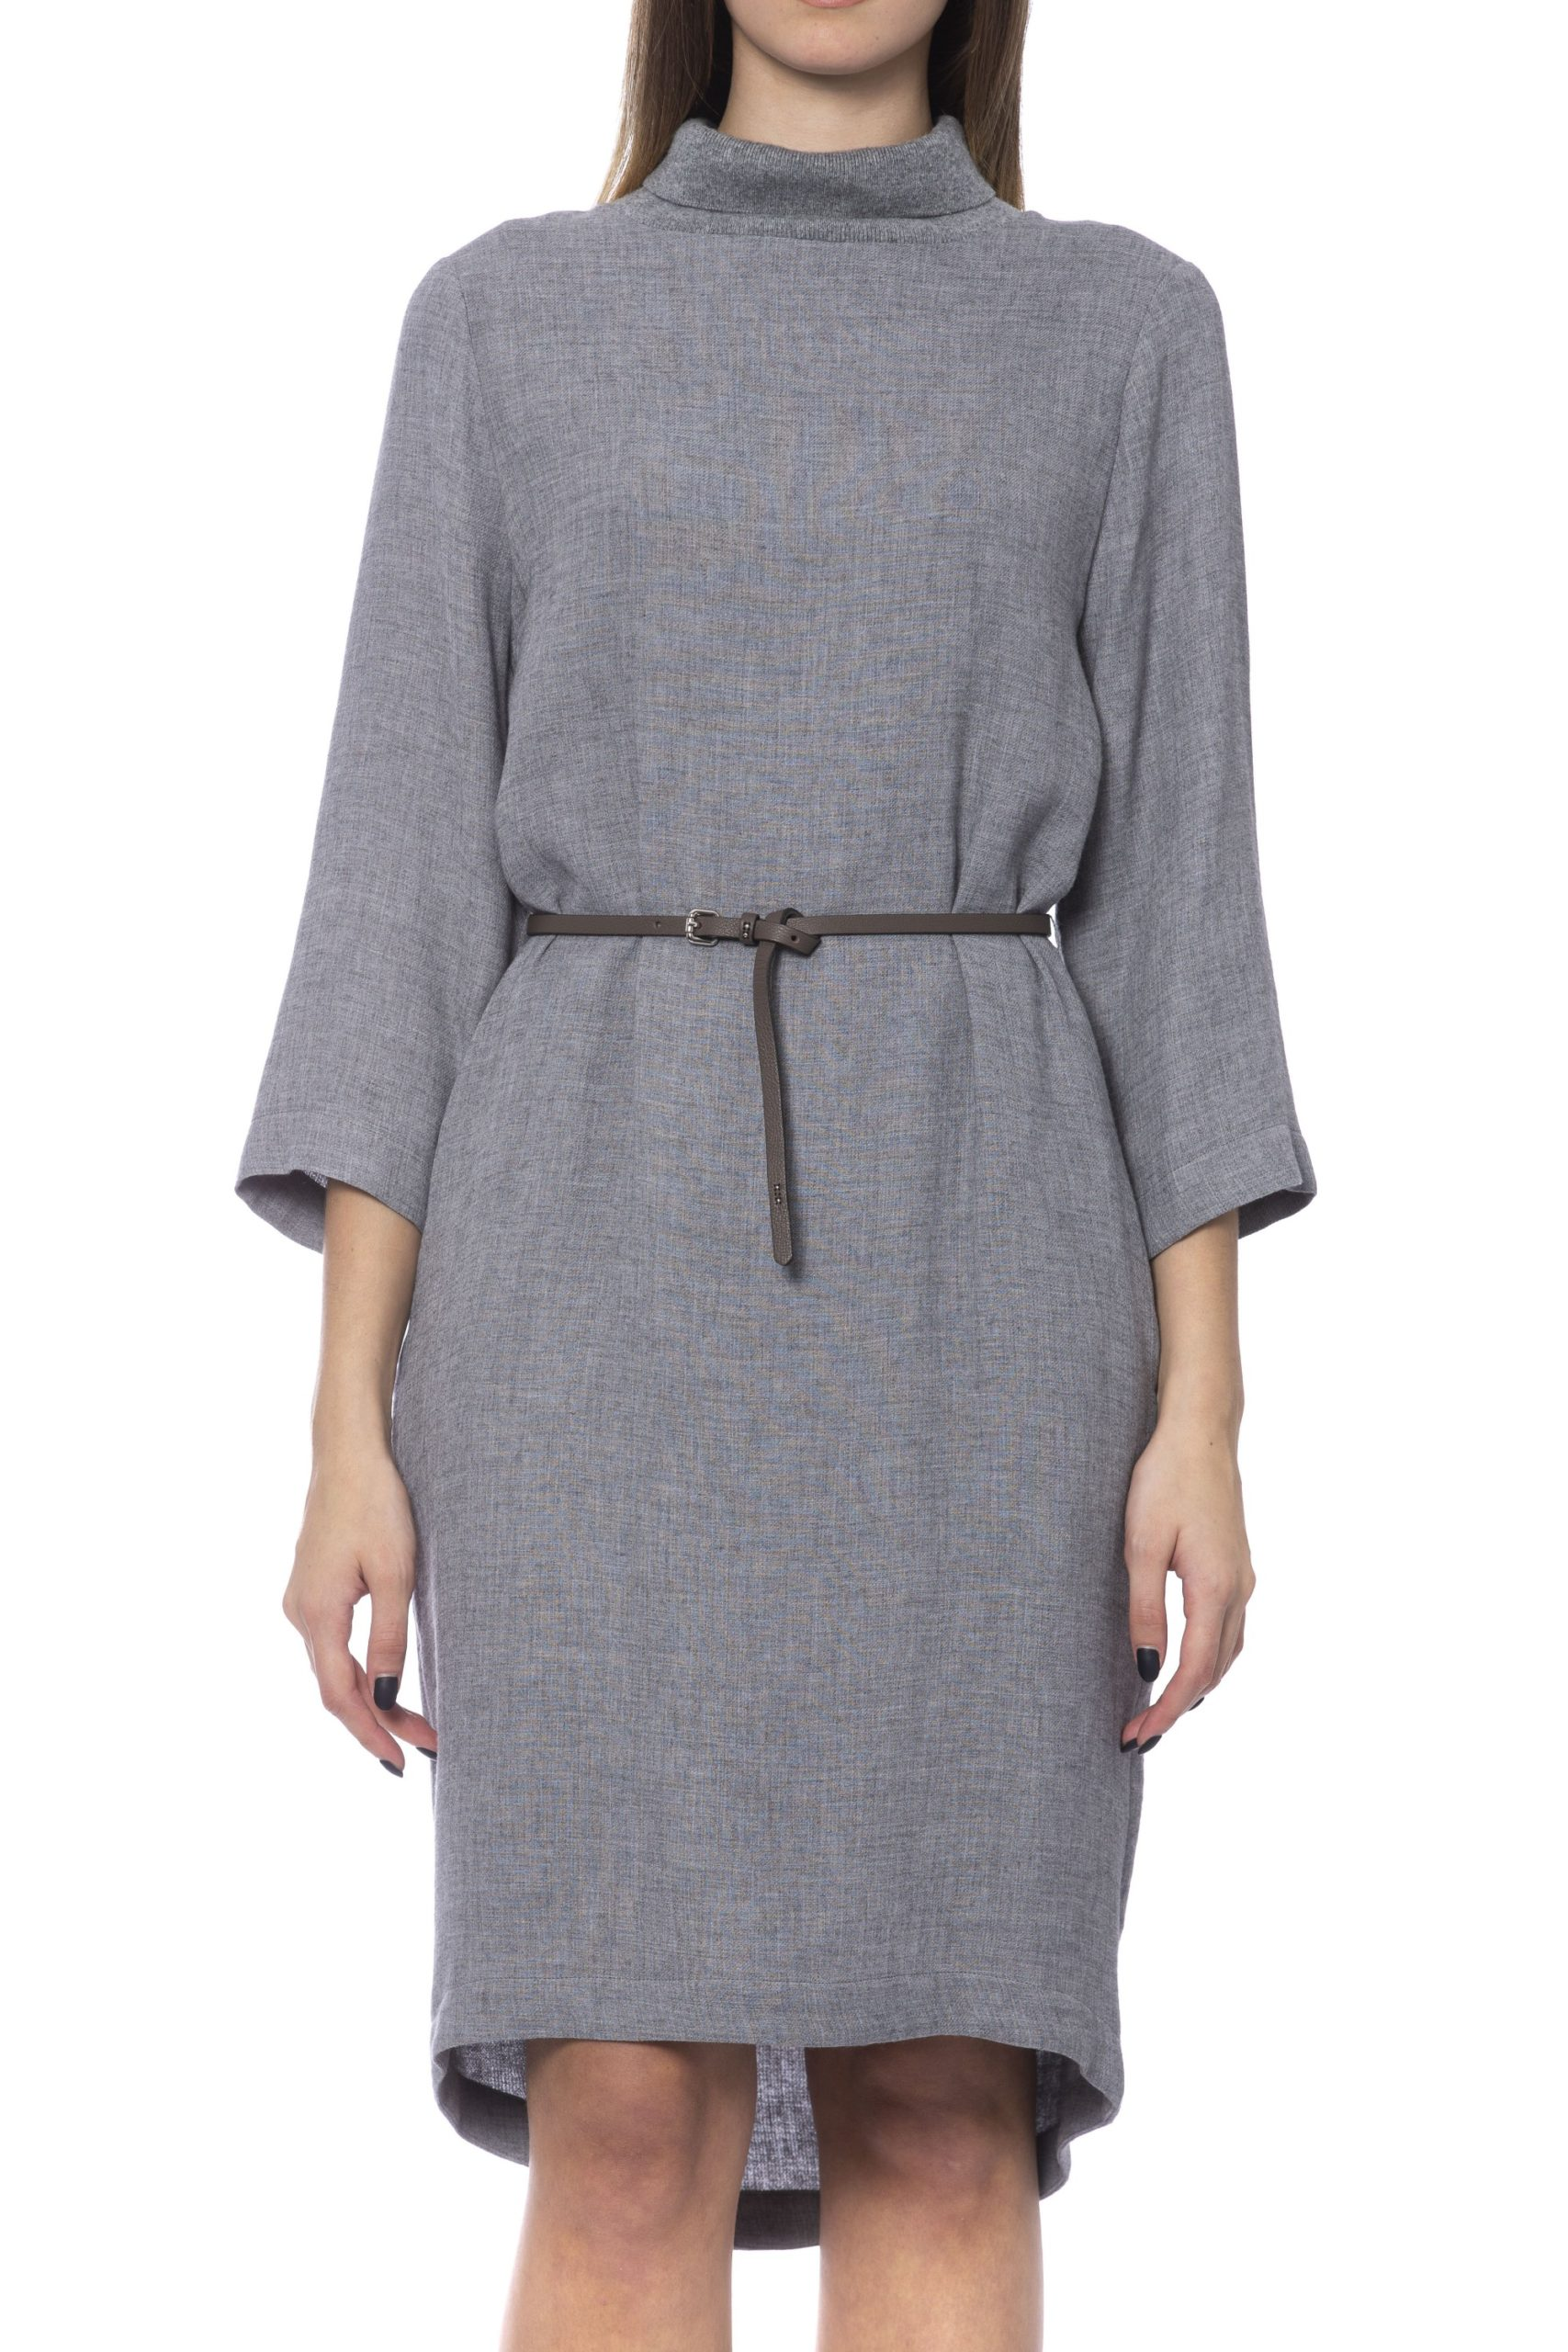 Peserico Women's Dress Grey PE993800 - IT42 | S